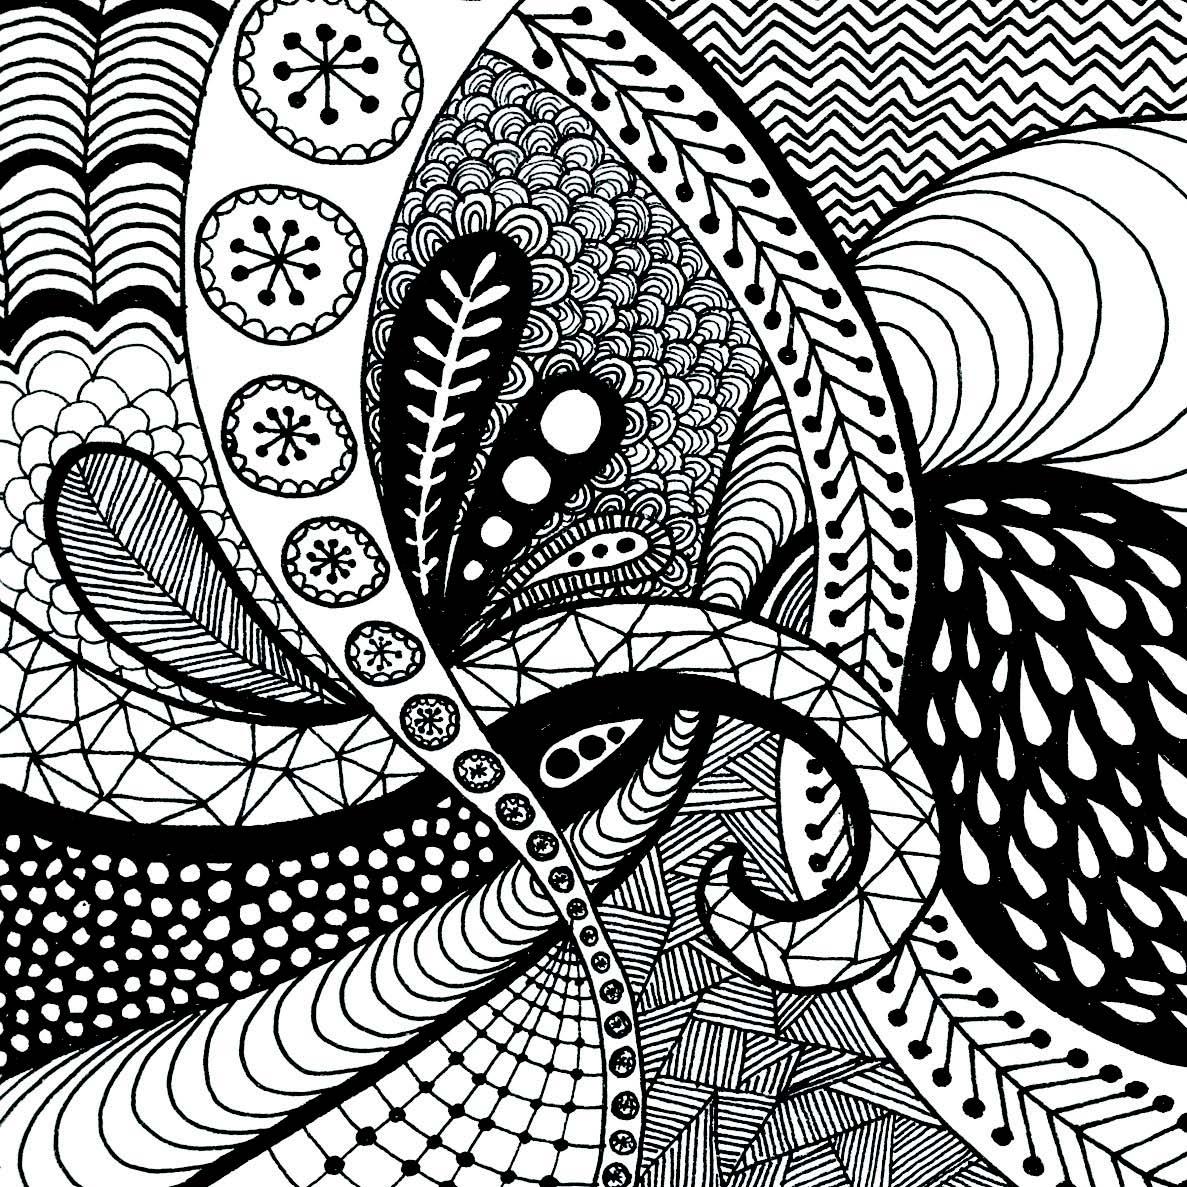 1187x1187 Simple Zen Drawing Zen Flower Drawing